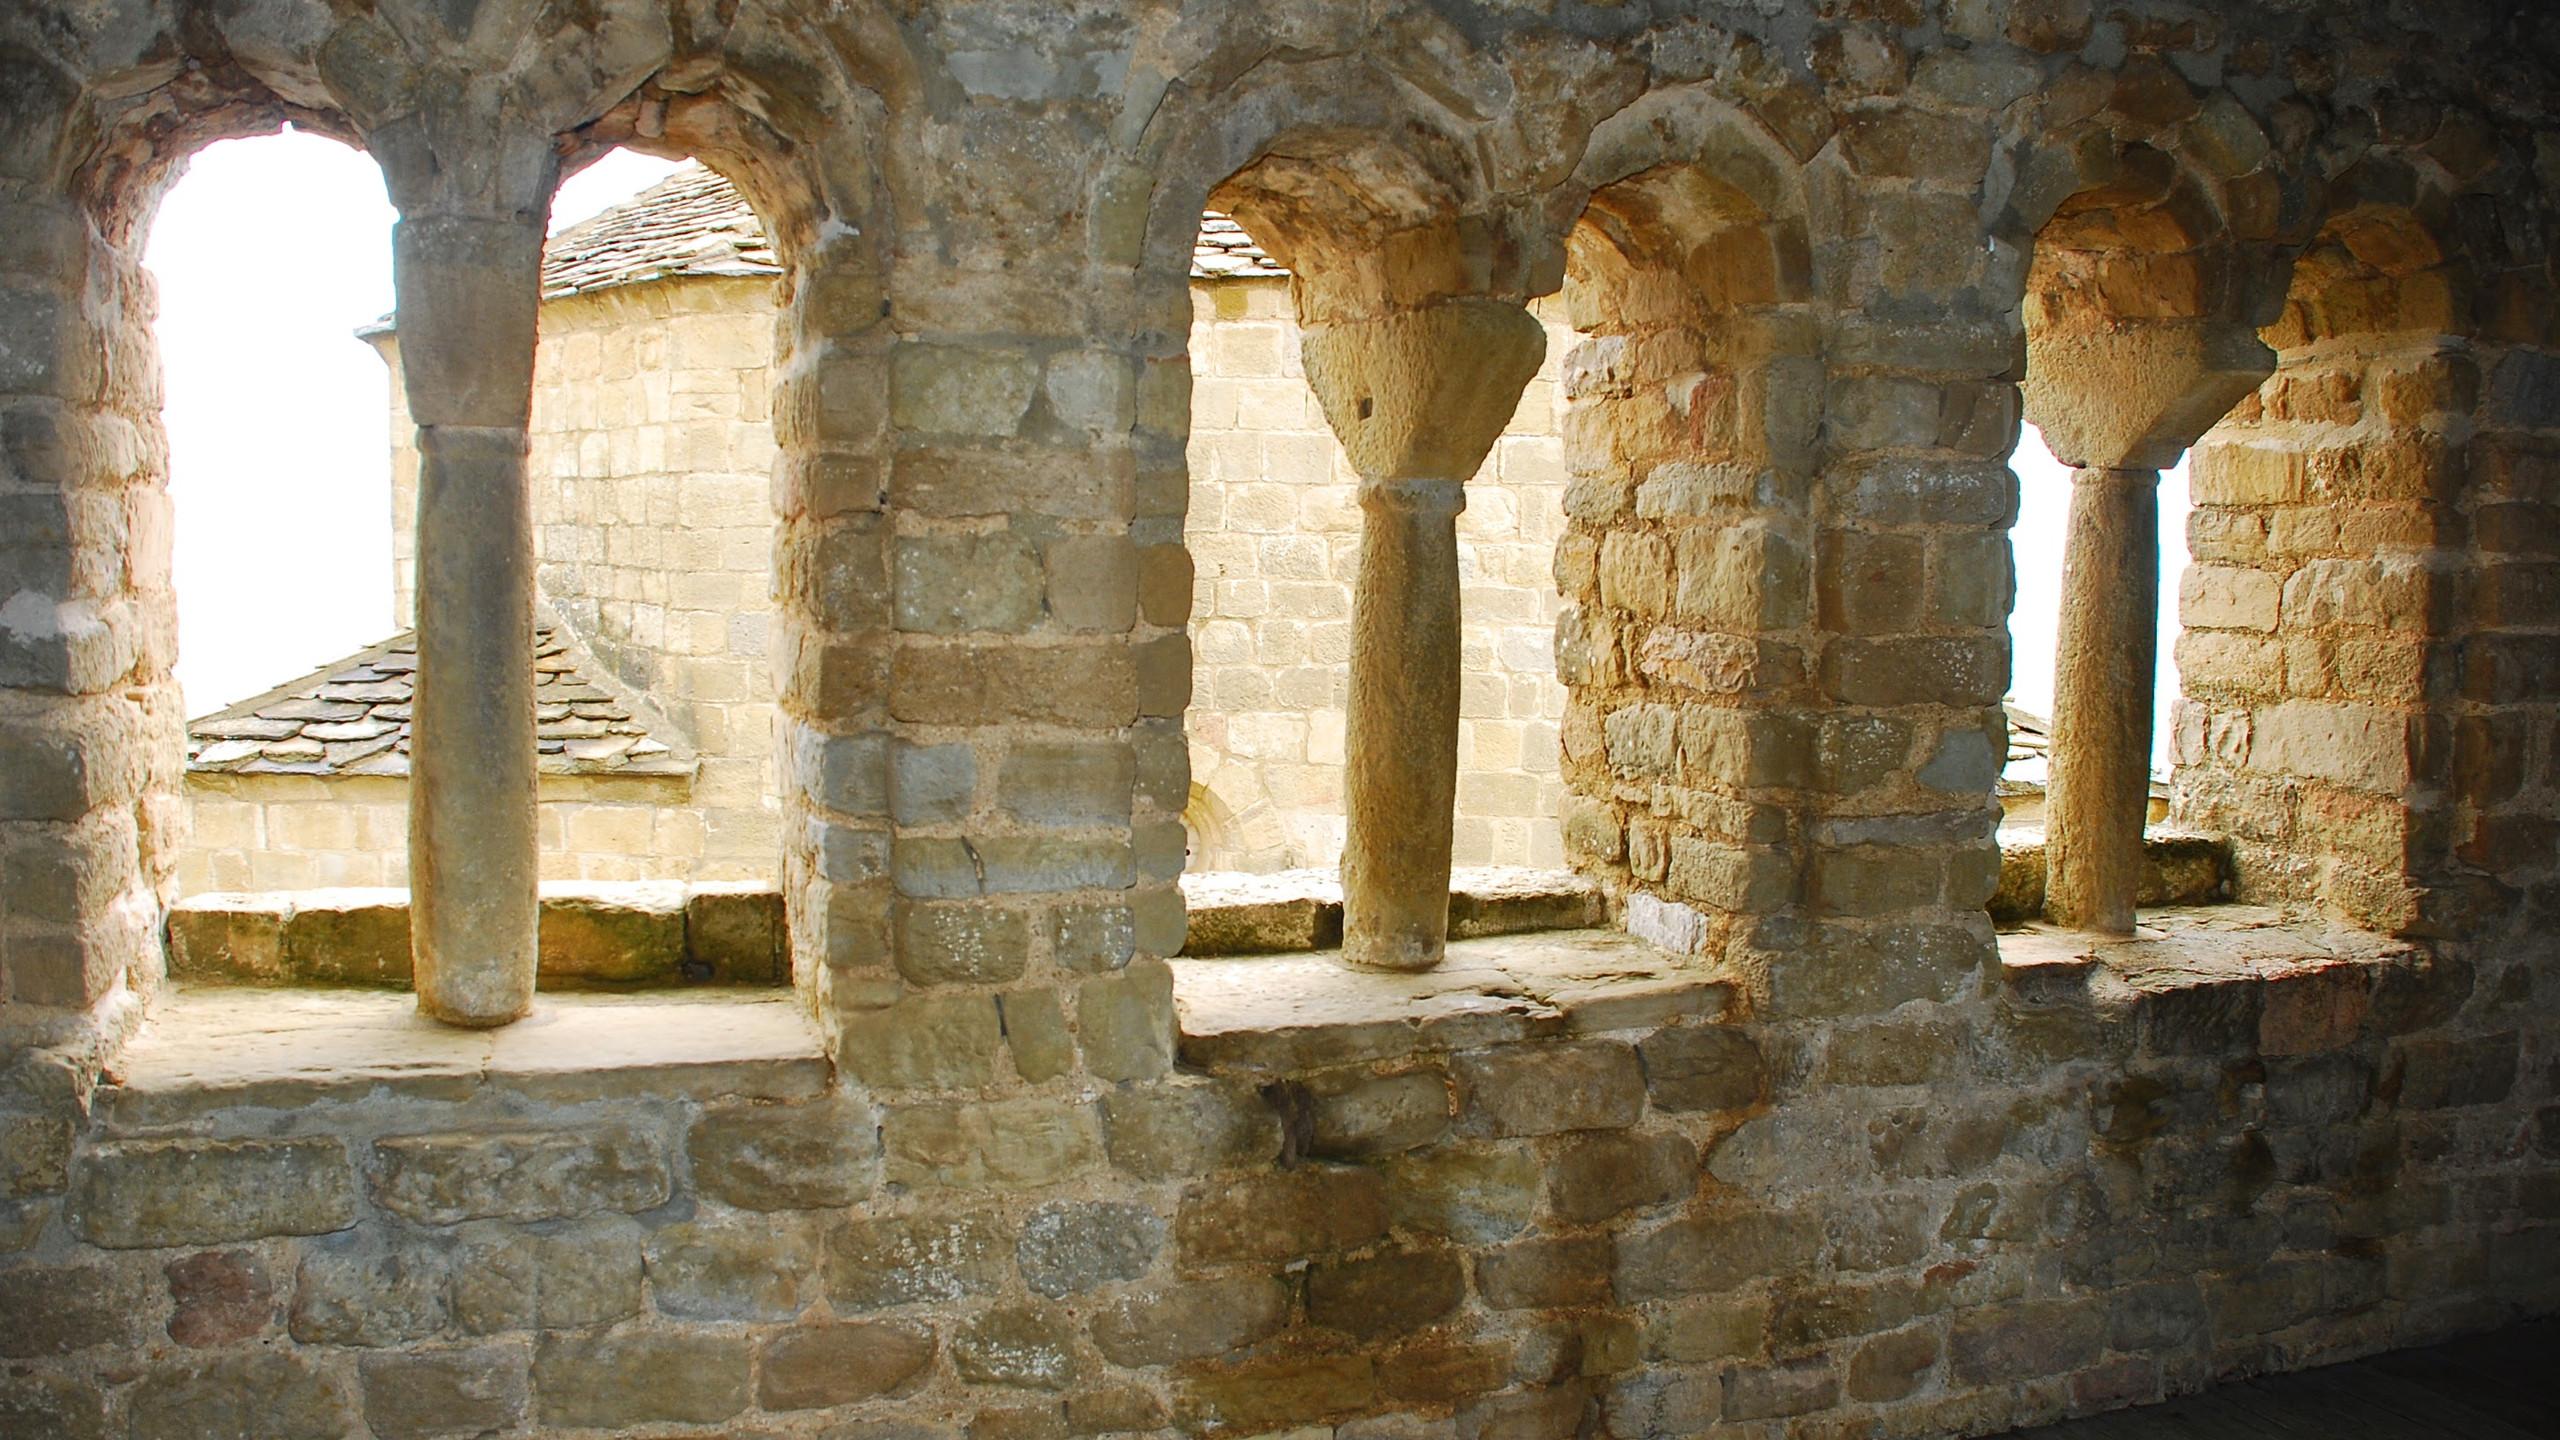 Castillo de Loarre - 116